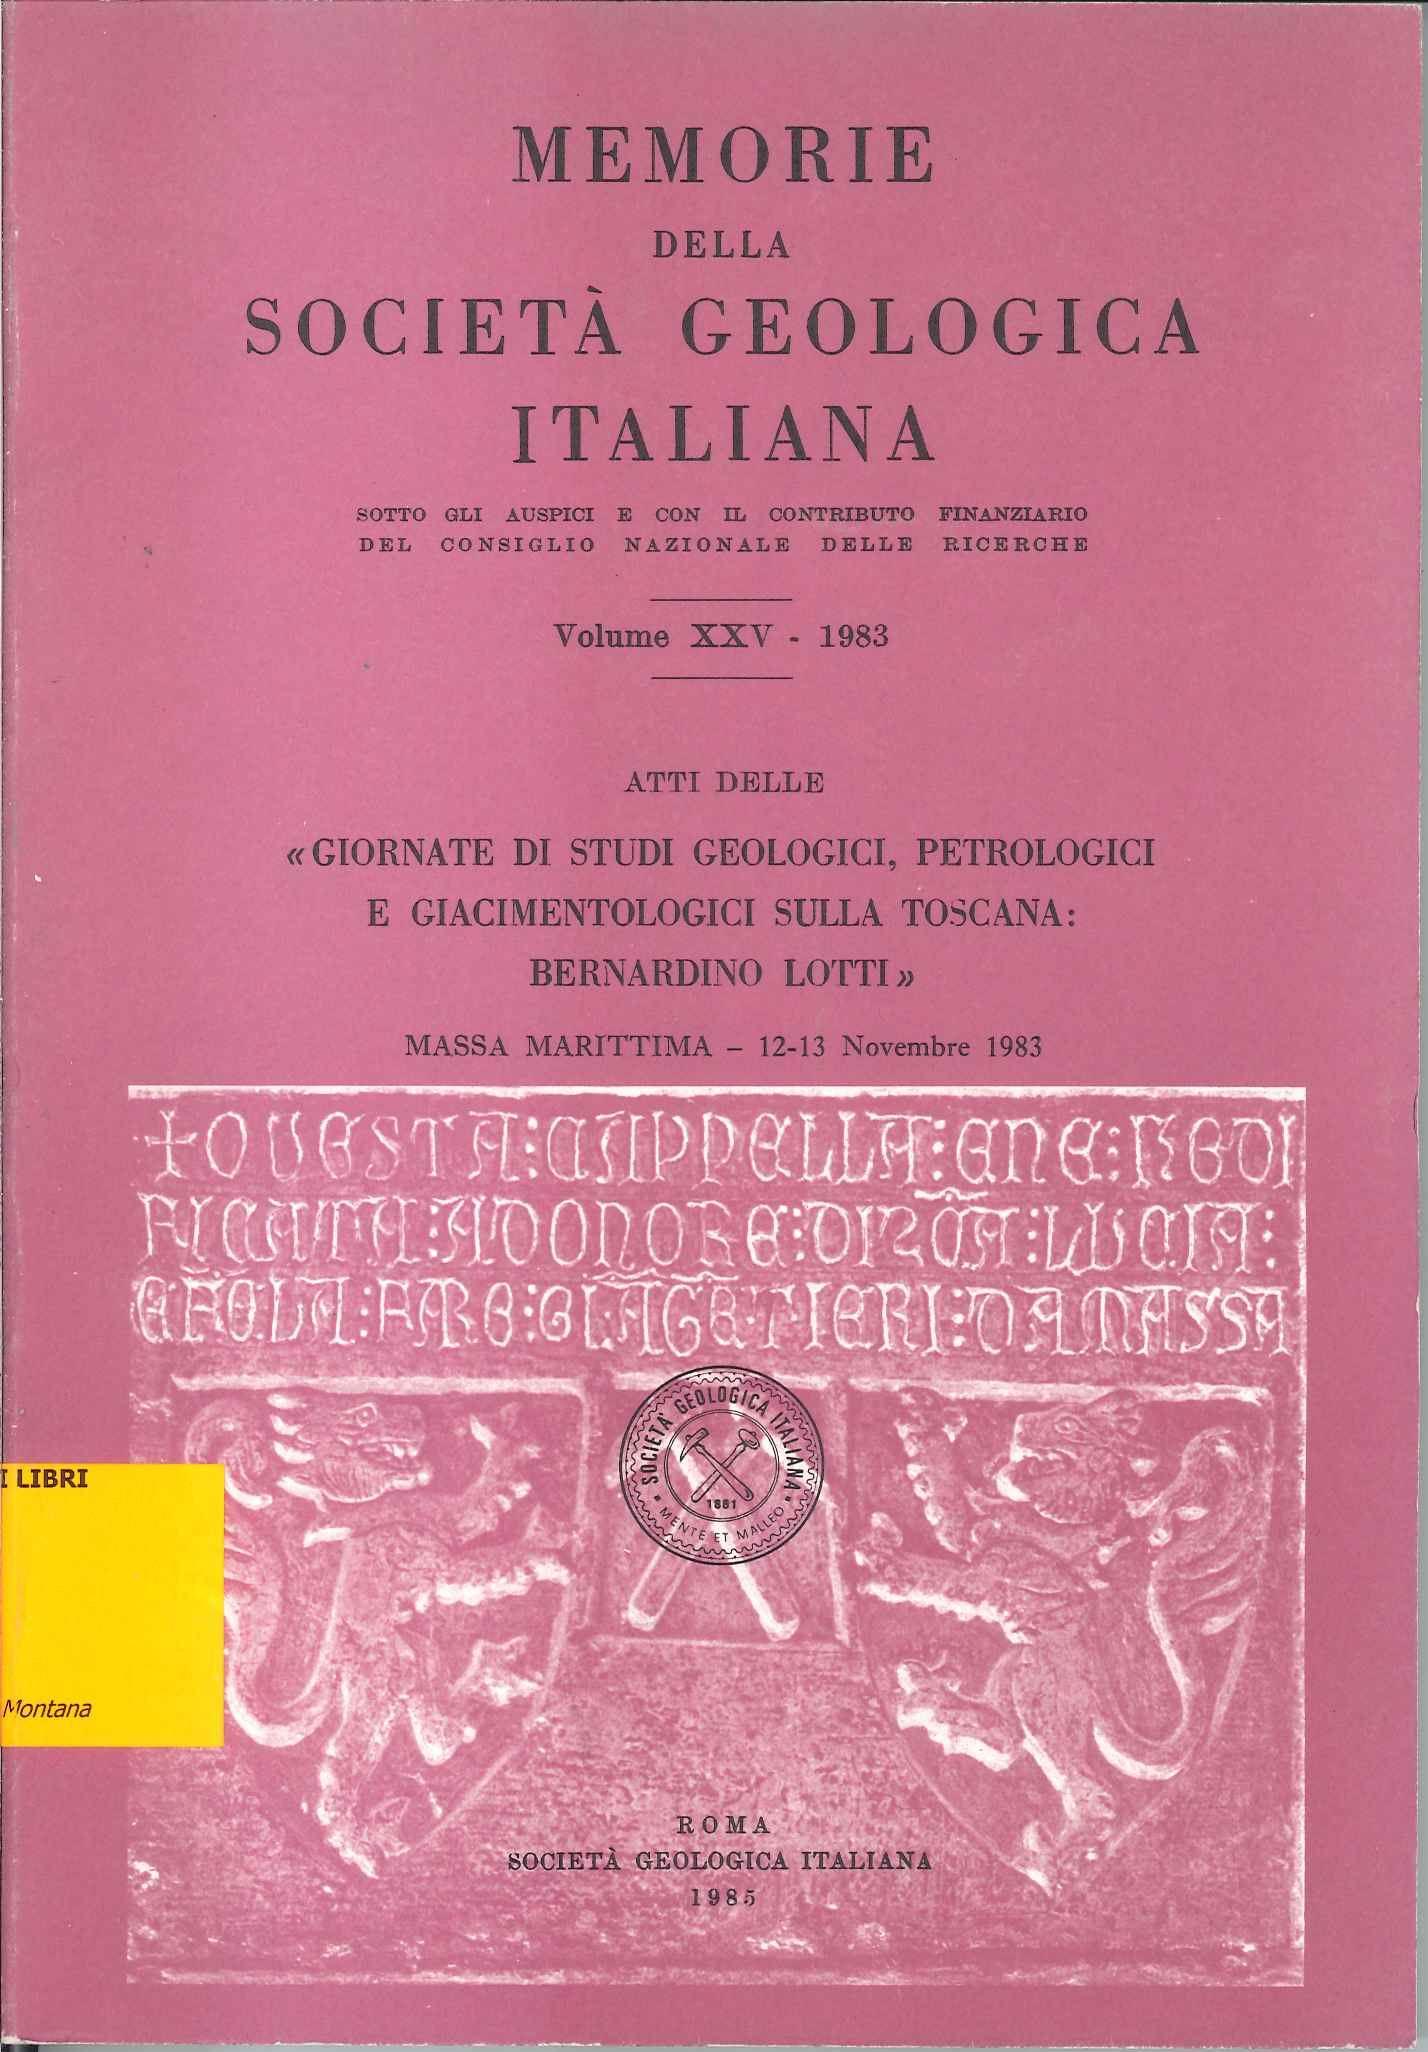 Memorie della Societa geologica italiana, n. 25